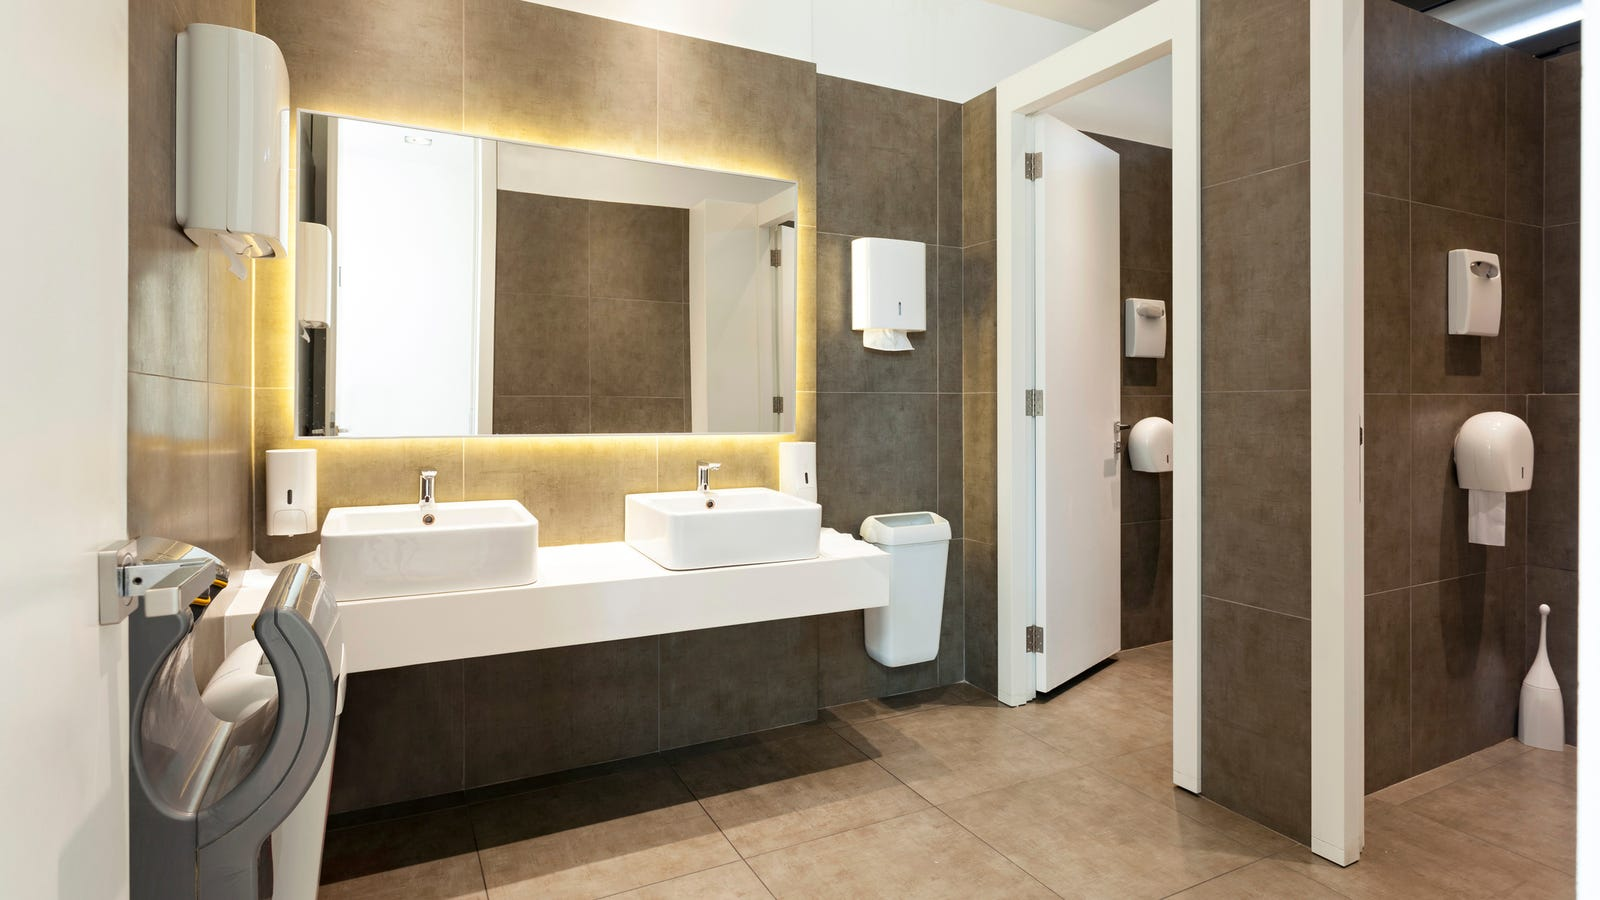 Toilets Of Boston Instagram Account Rates Restaurant Bathrooms